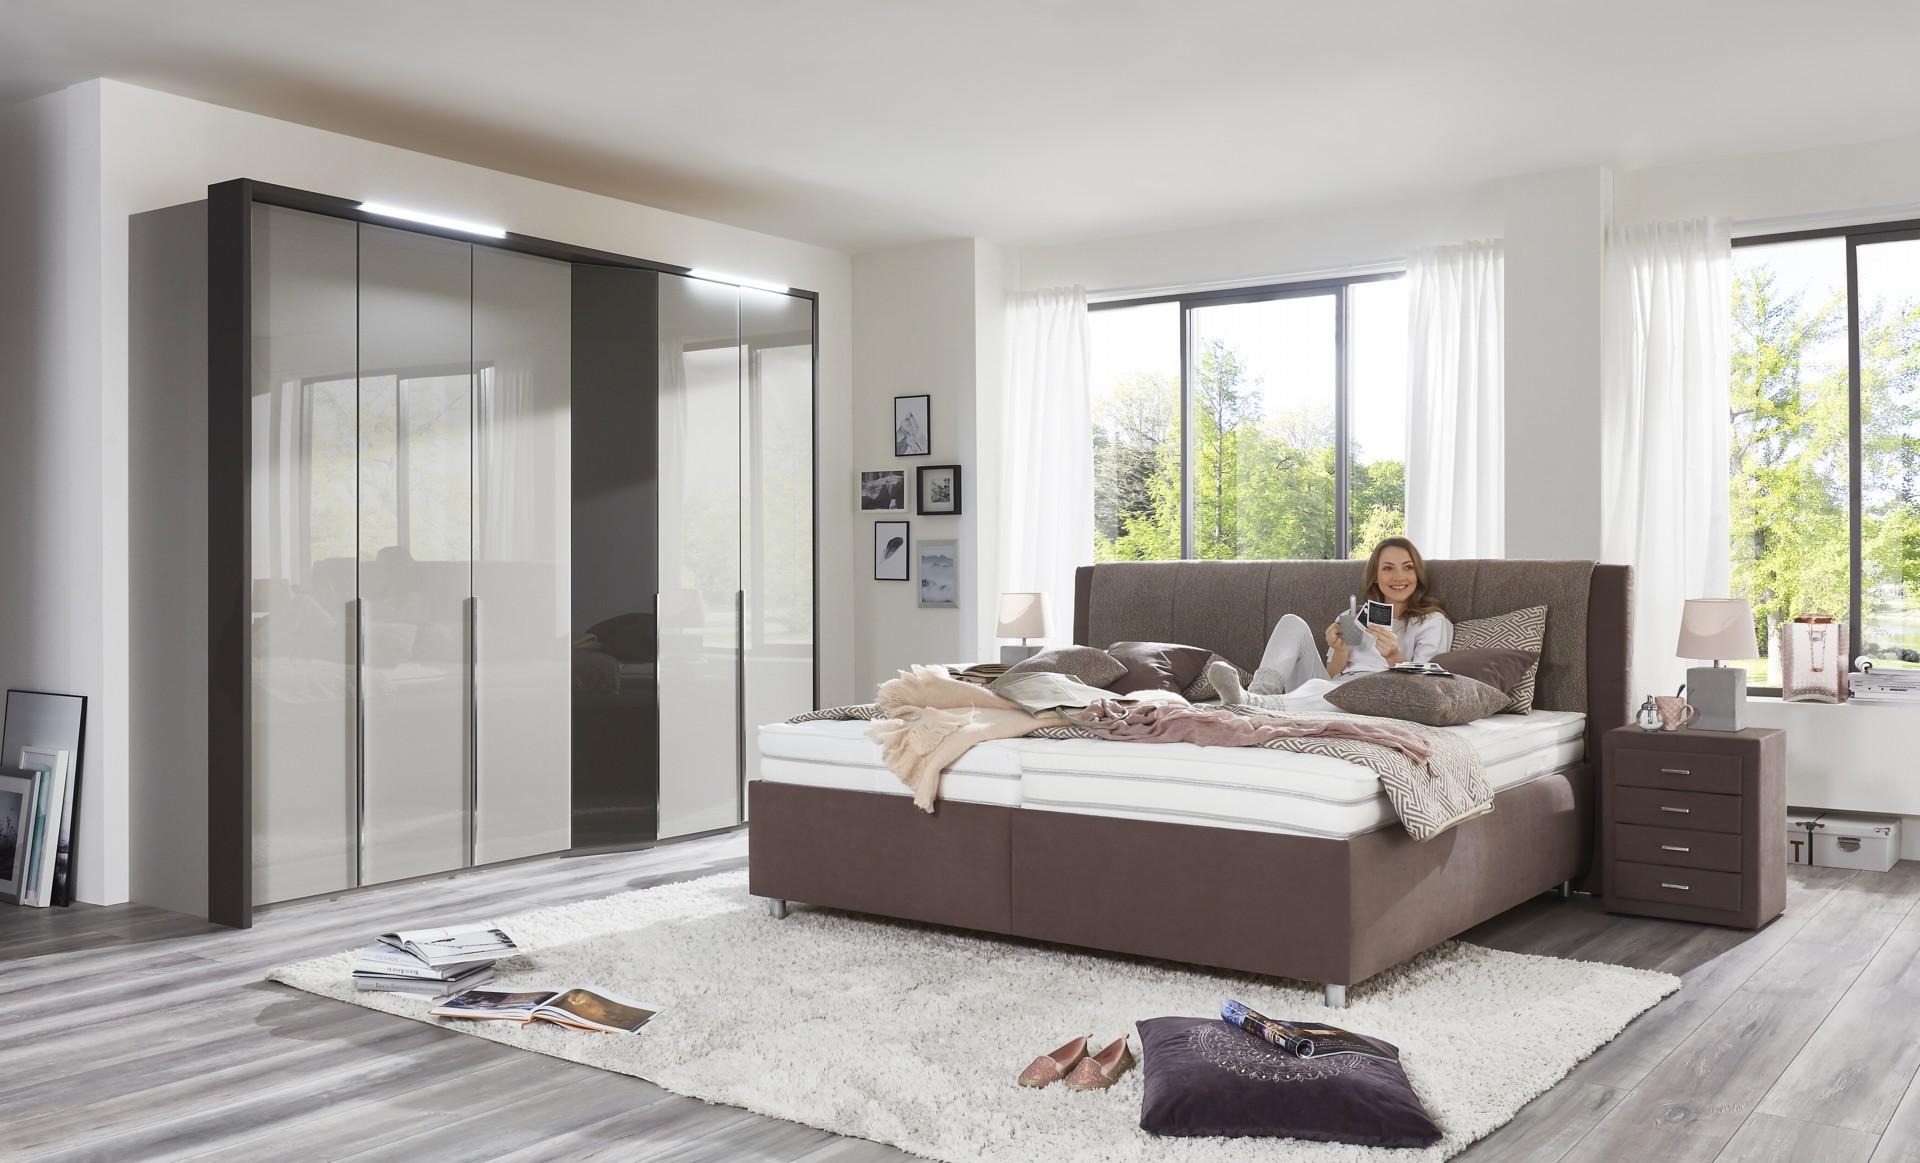 Interliving Lebenswelt Schlafzimmer